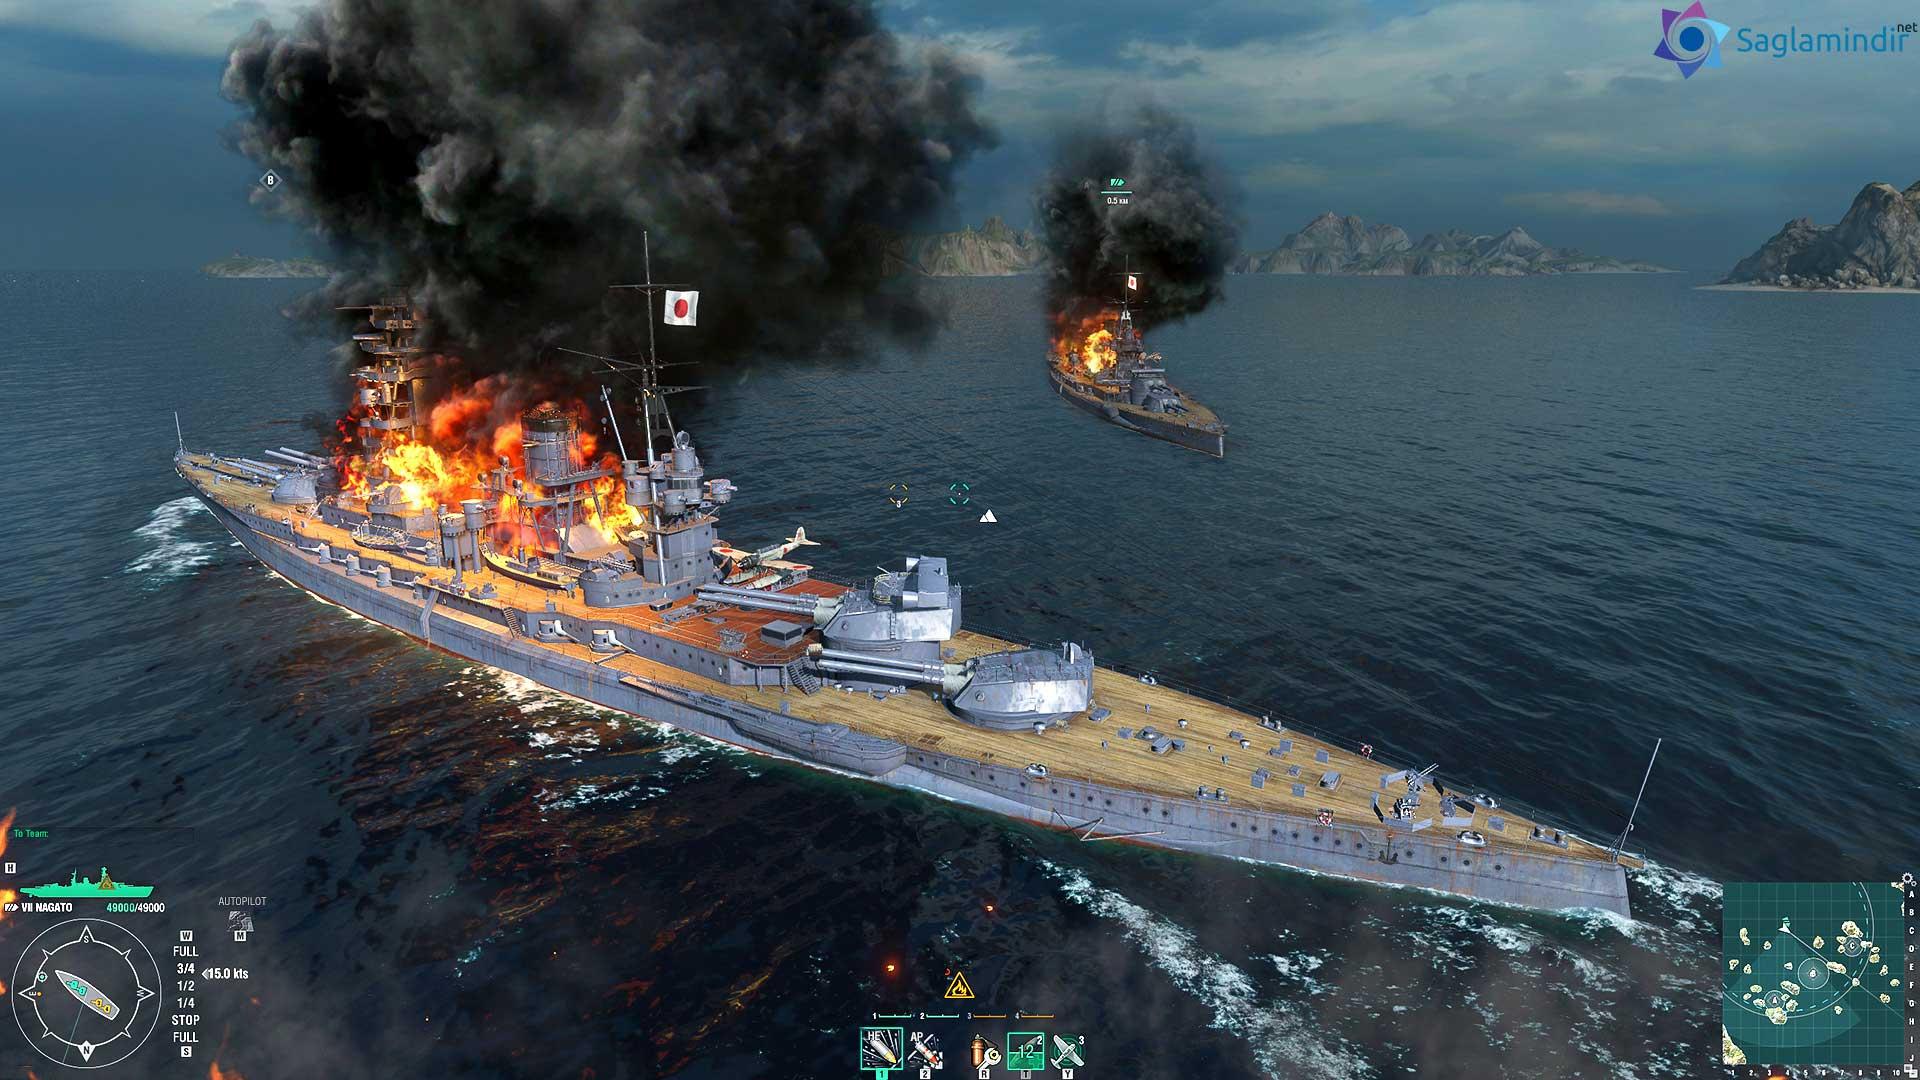 world of warships sağlam indir